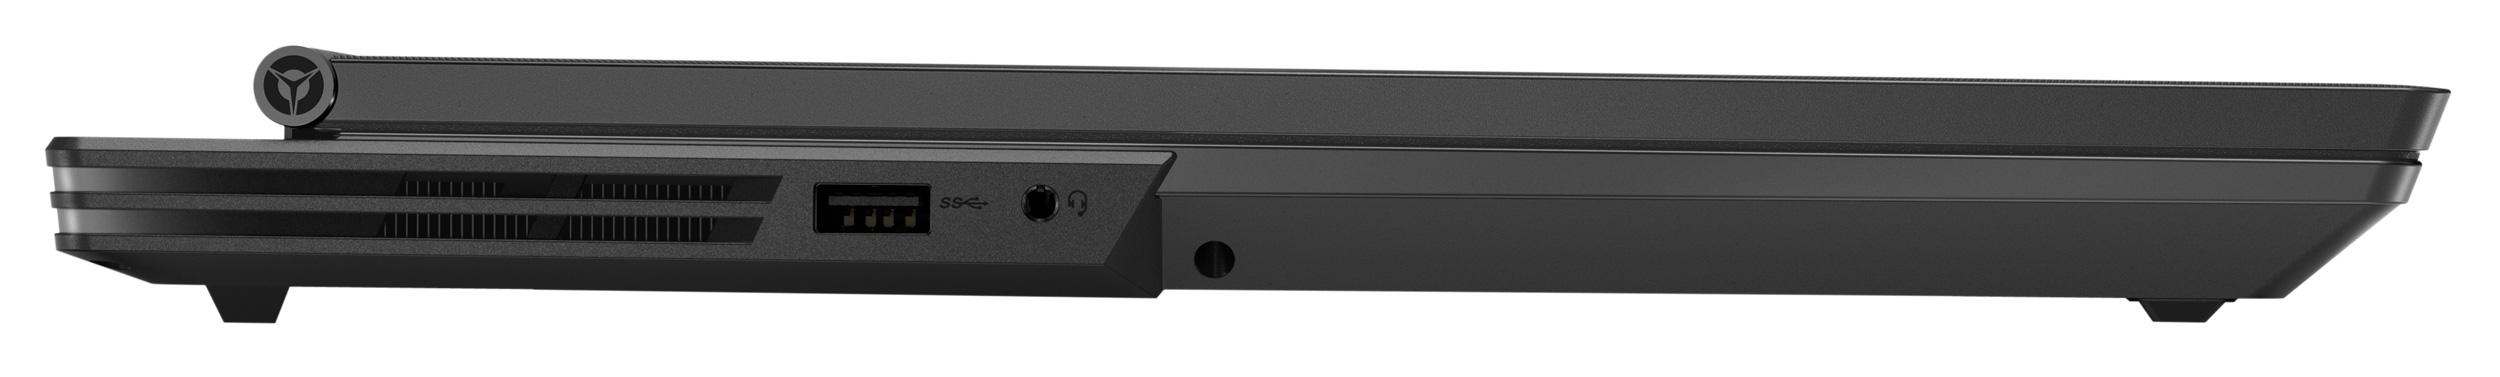 Фото  Ноутбук Lenovo Legion Y540-15IRH Black (81SX012DRE)